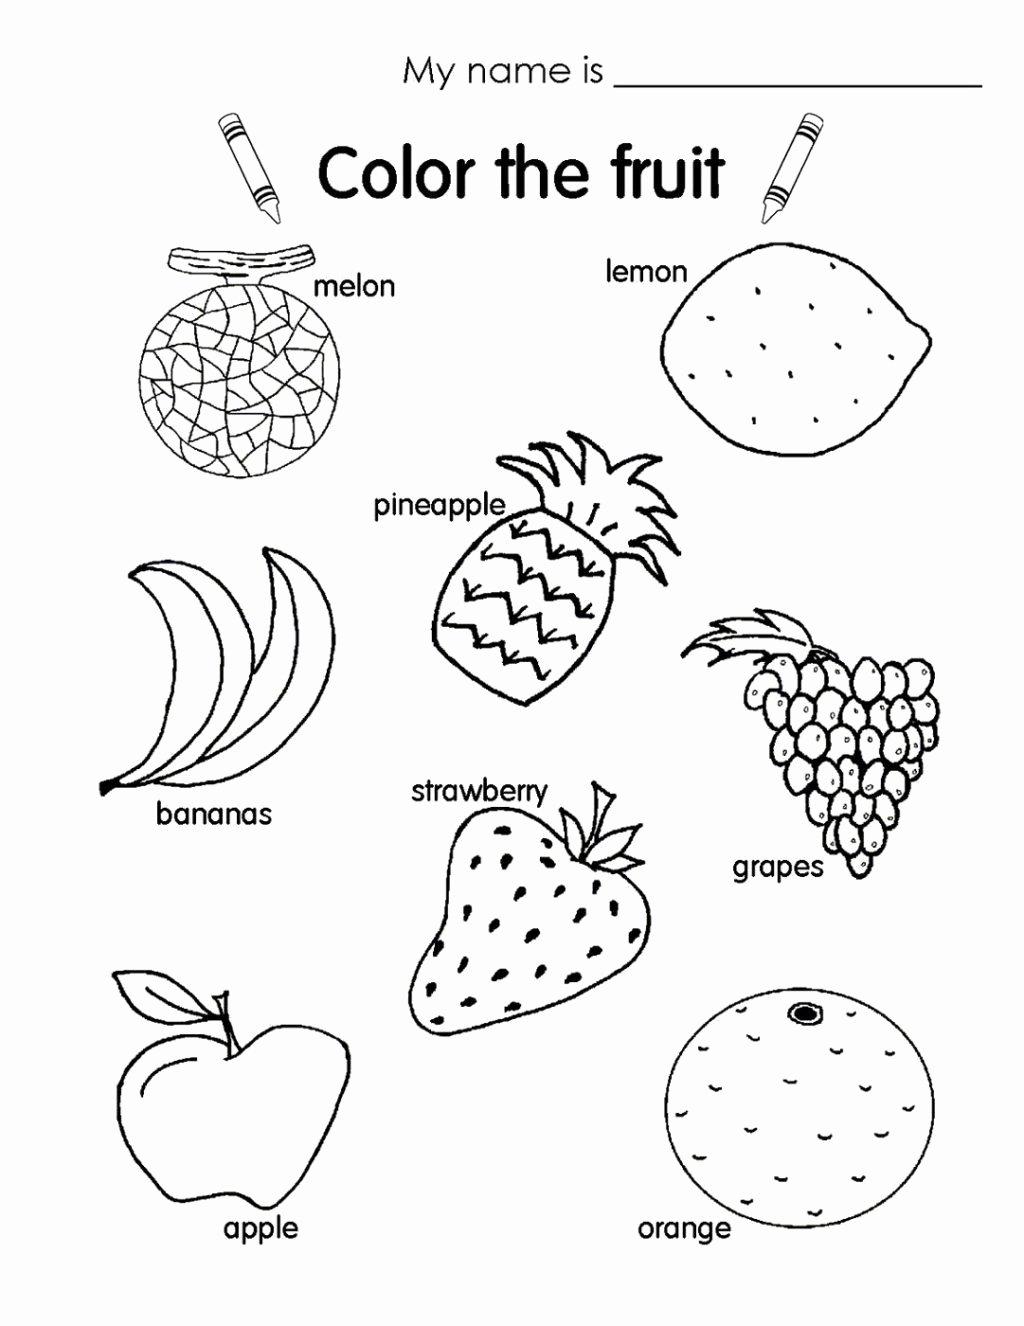 Fruits Worksheets for Preschoolers Printable Worksheet Funorksheets for Kids Picture Ideasorksheet